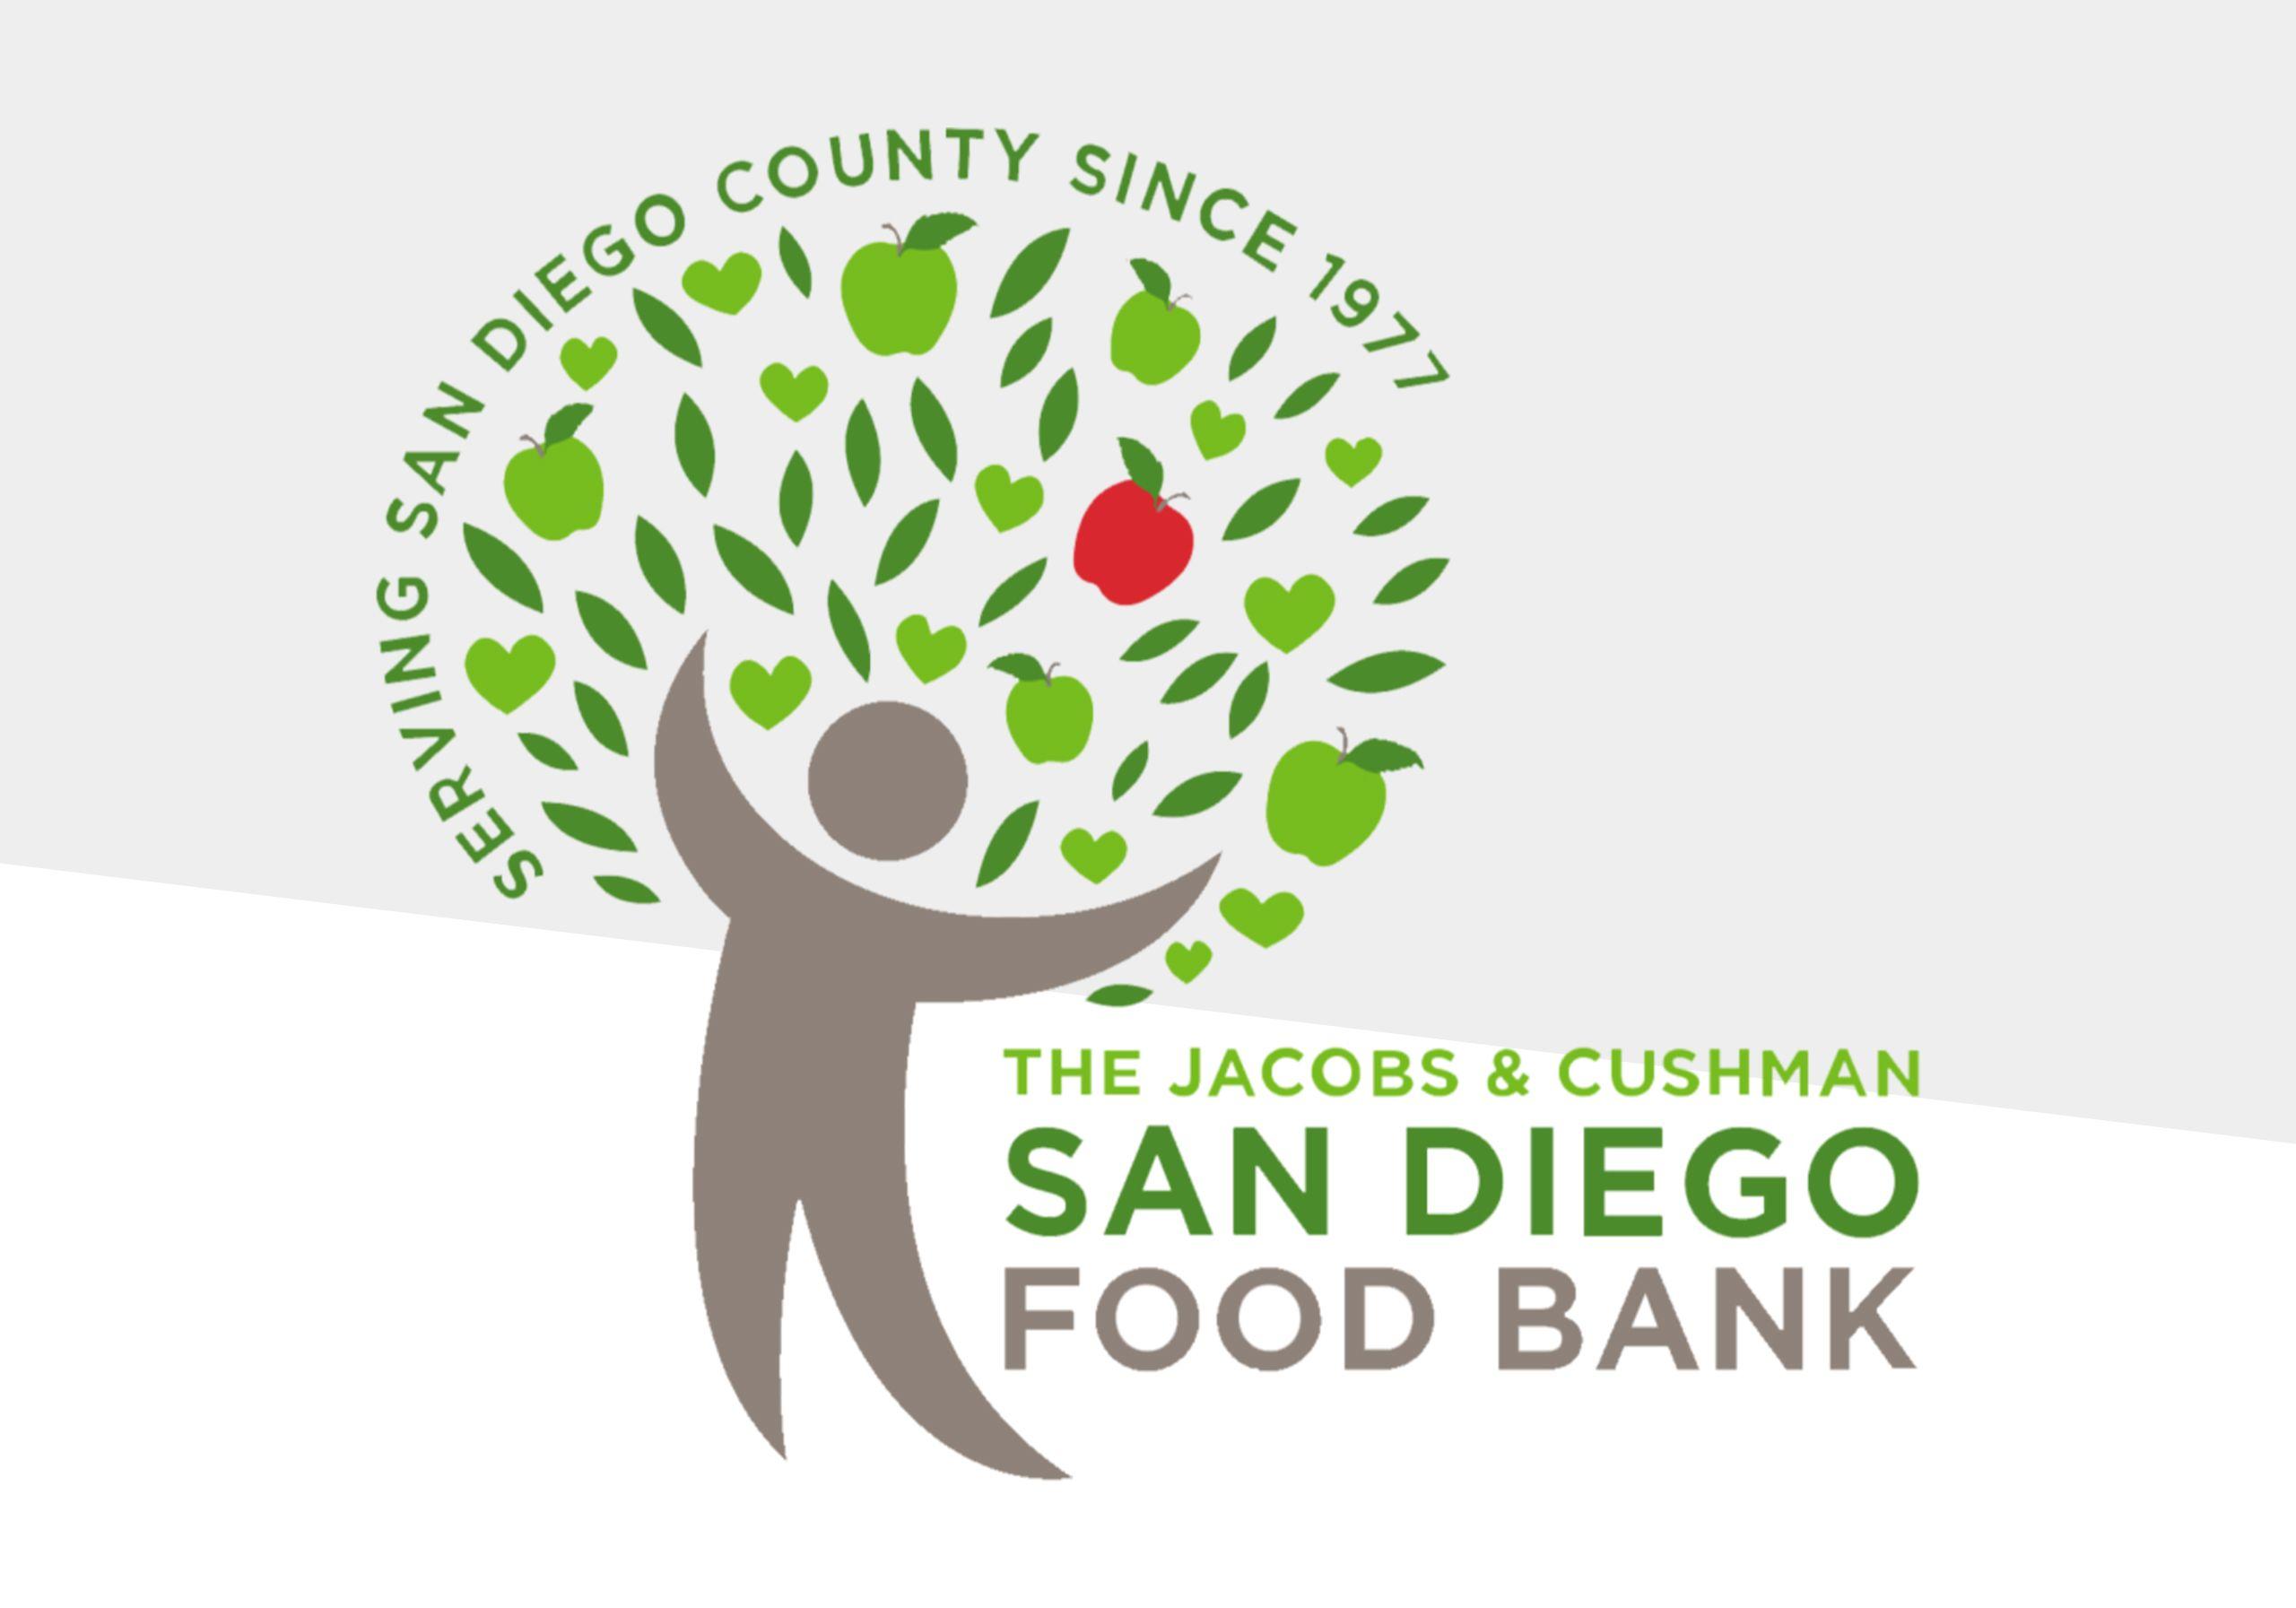 The Jacobs and Cushman San Diego Food Bank